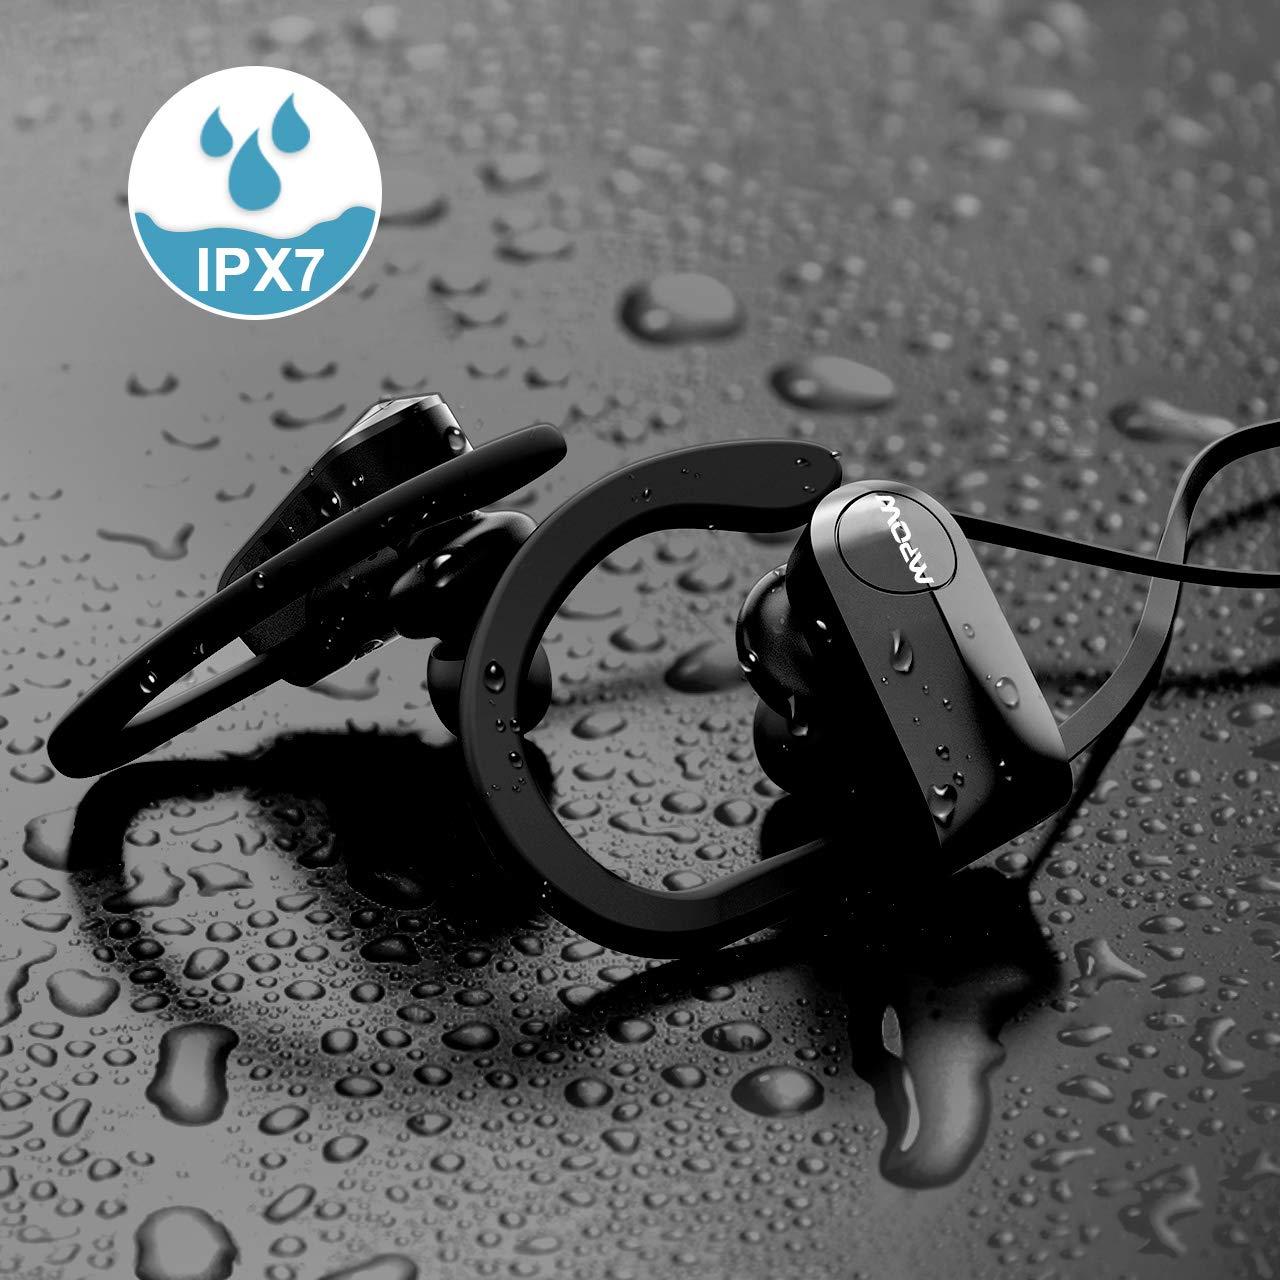 Mpow D7 Bluetooth Headphones Sport, 10H Playtime & IPX7 Waterproof Wireless Headphones Sport Earbuds W/Bass Stereo Sound, Running Headphones Bluetooth Earphones W/CVC 6.0 Noise Cancelling Mic, Black by Mpow (Image #5)